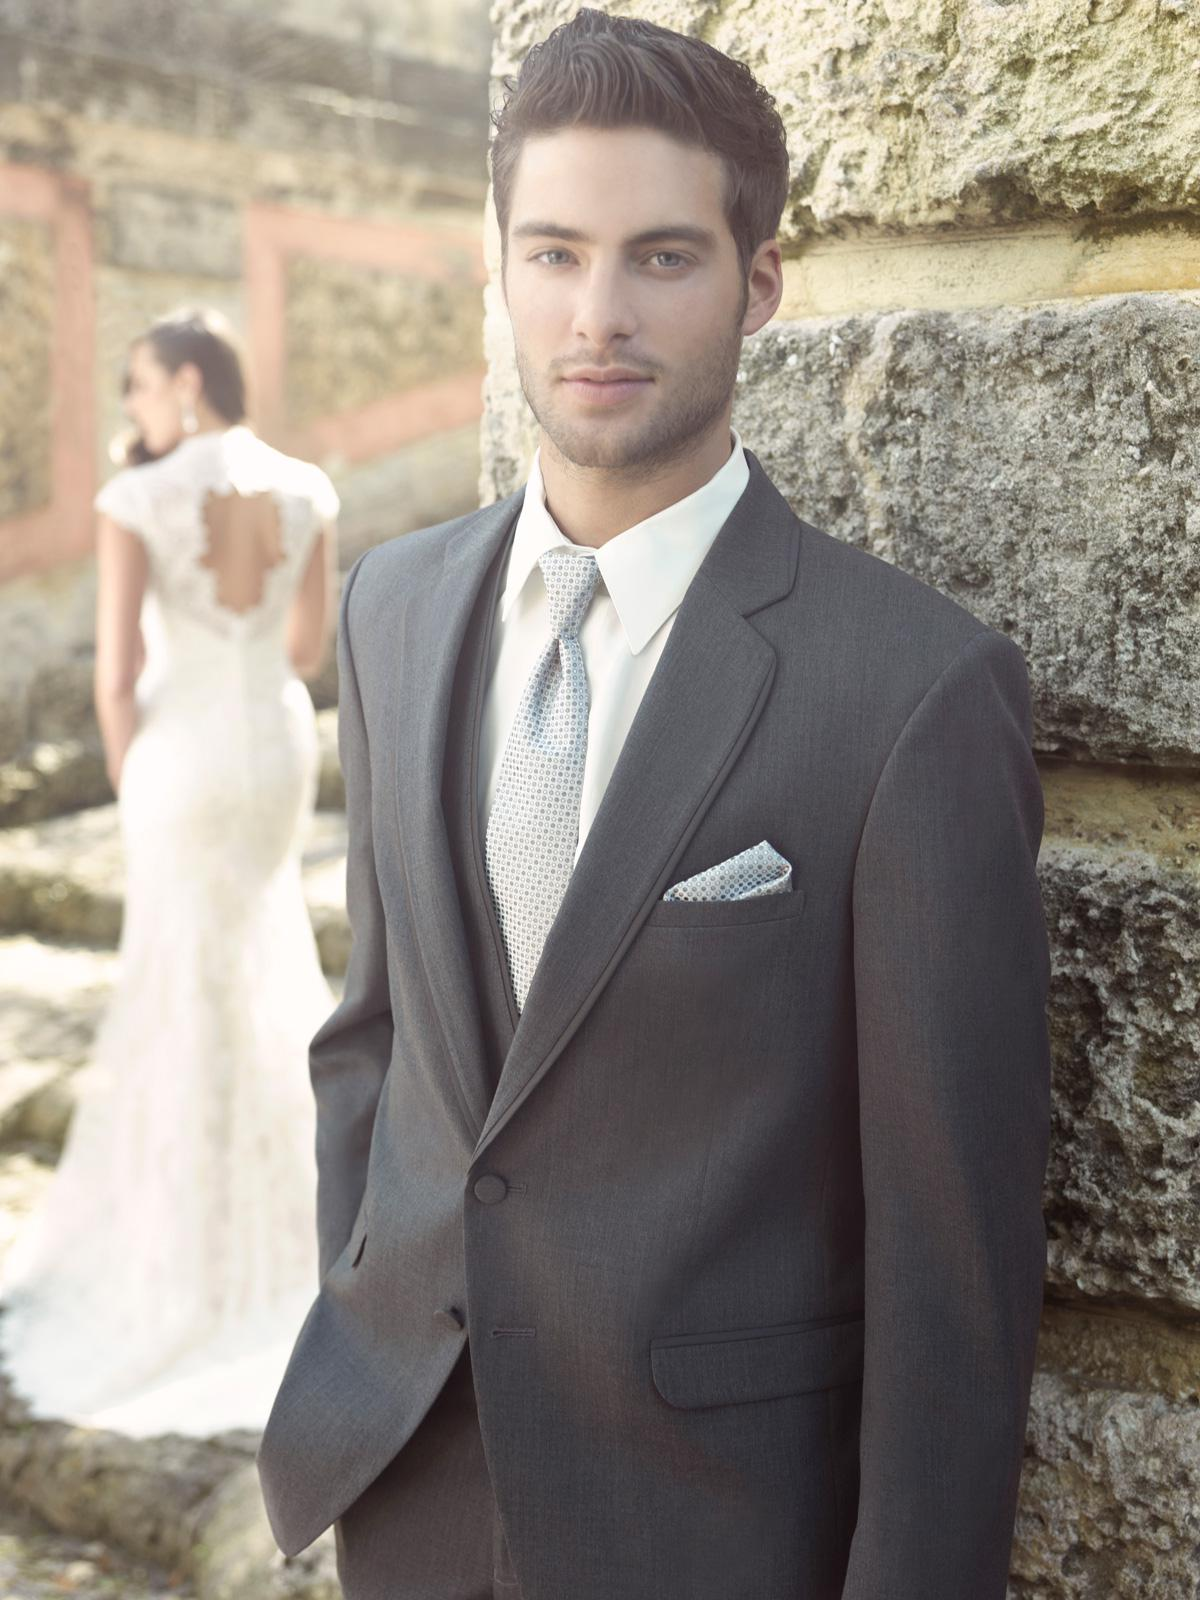 New Popular Groom Tuxedos Wedding Suits Prom Clothing Jacket Pants ...